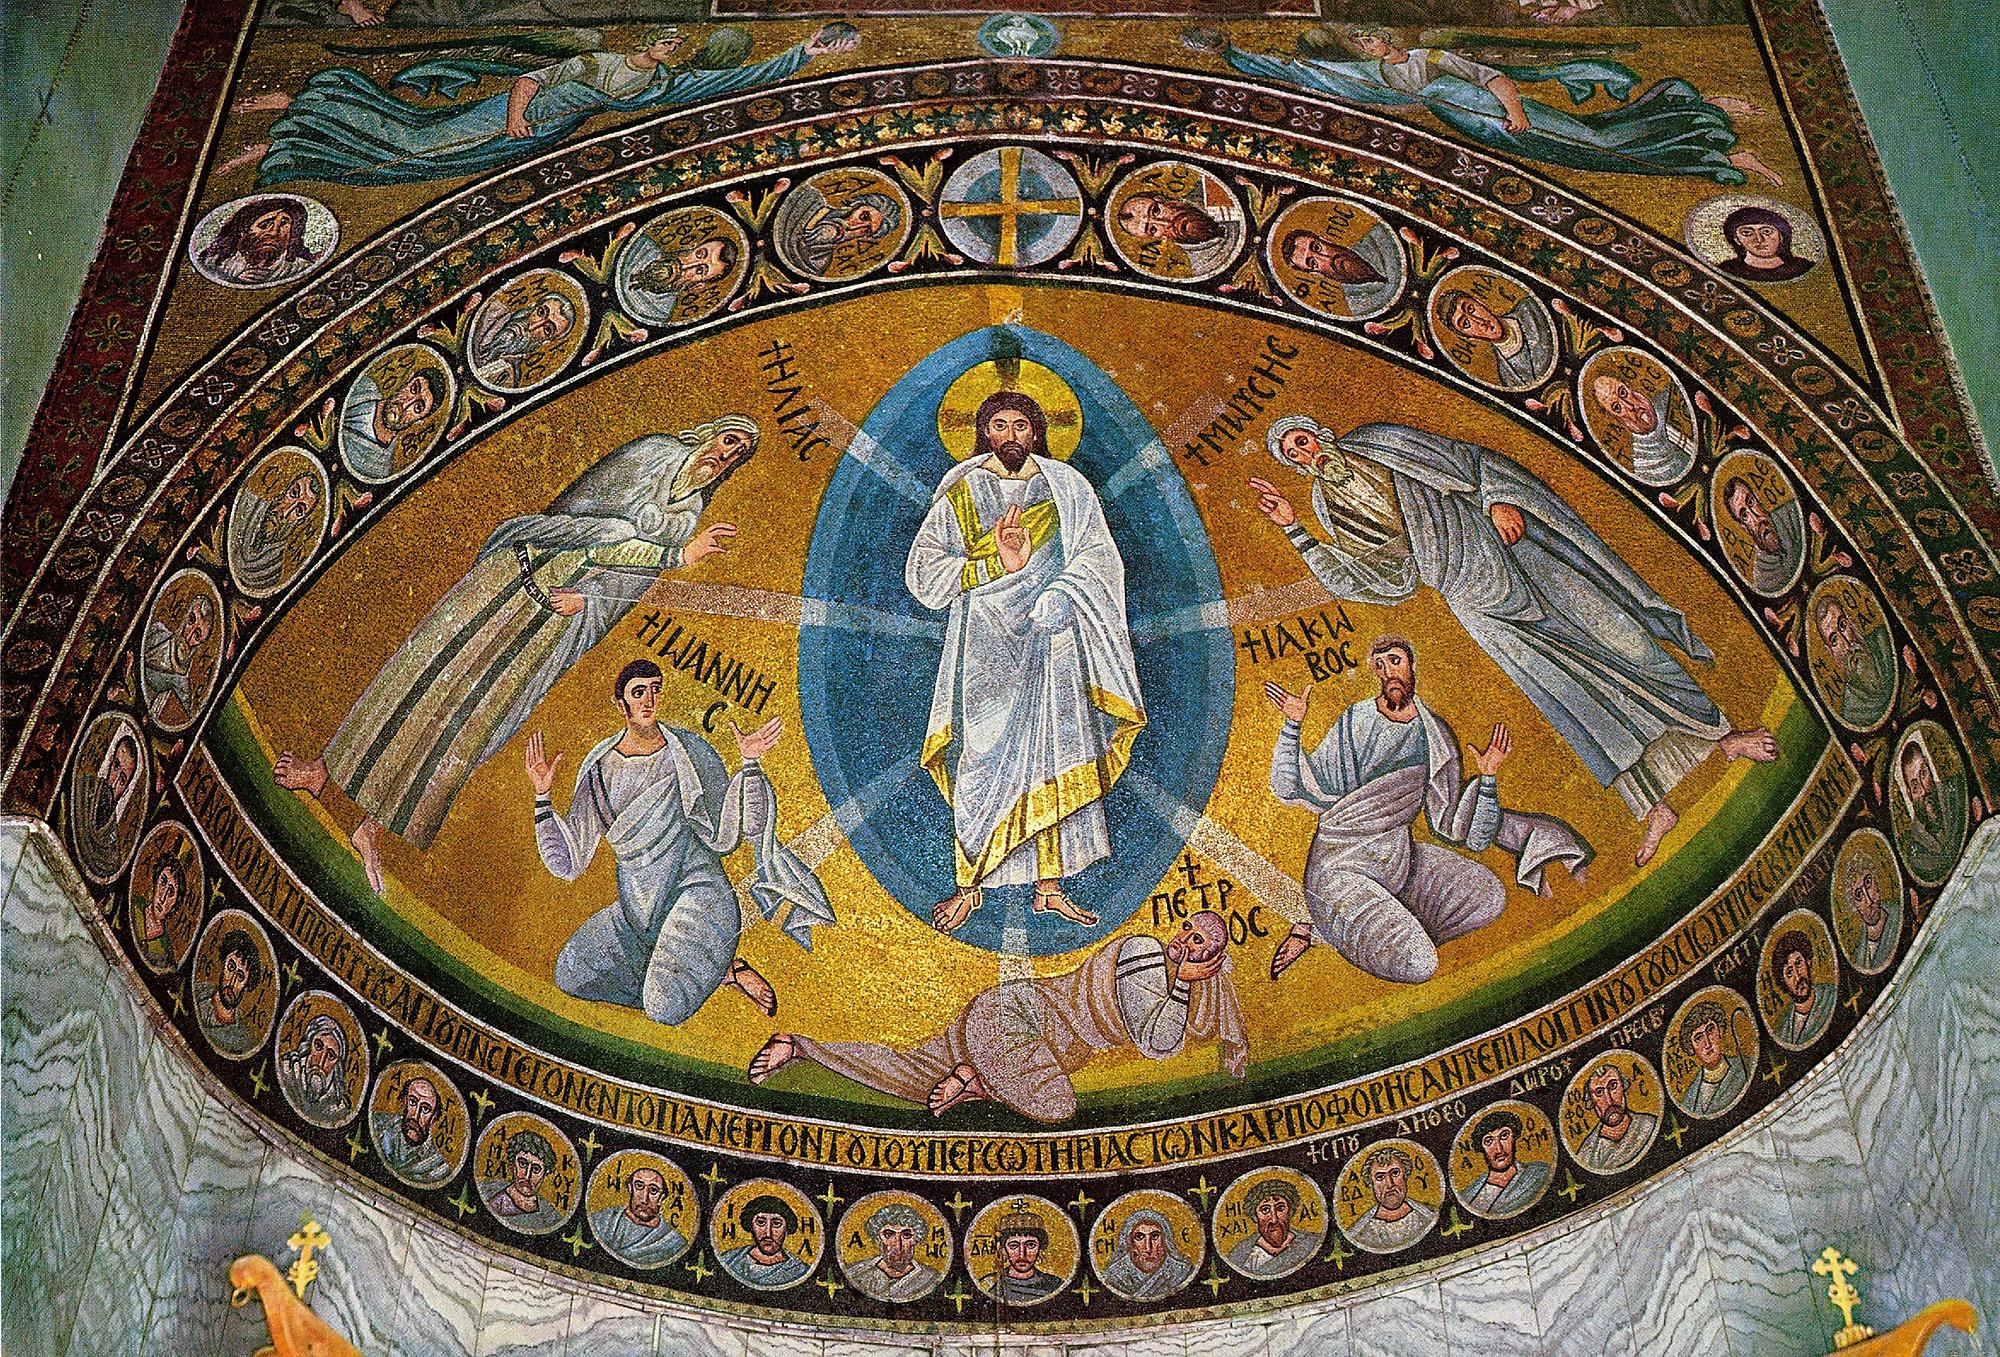 2020.08.06_Saint_Catherines_Transfiguration